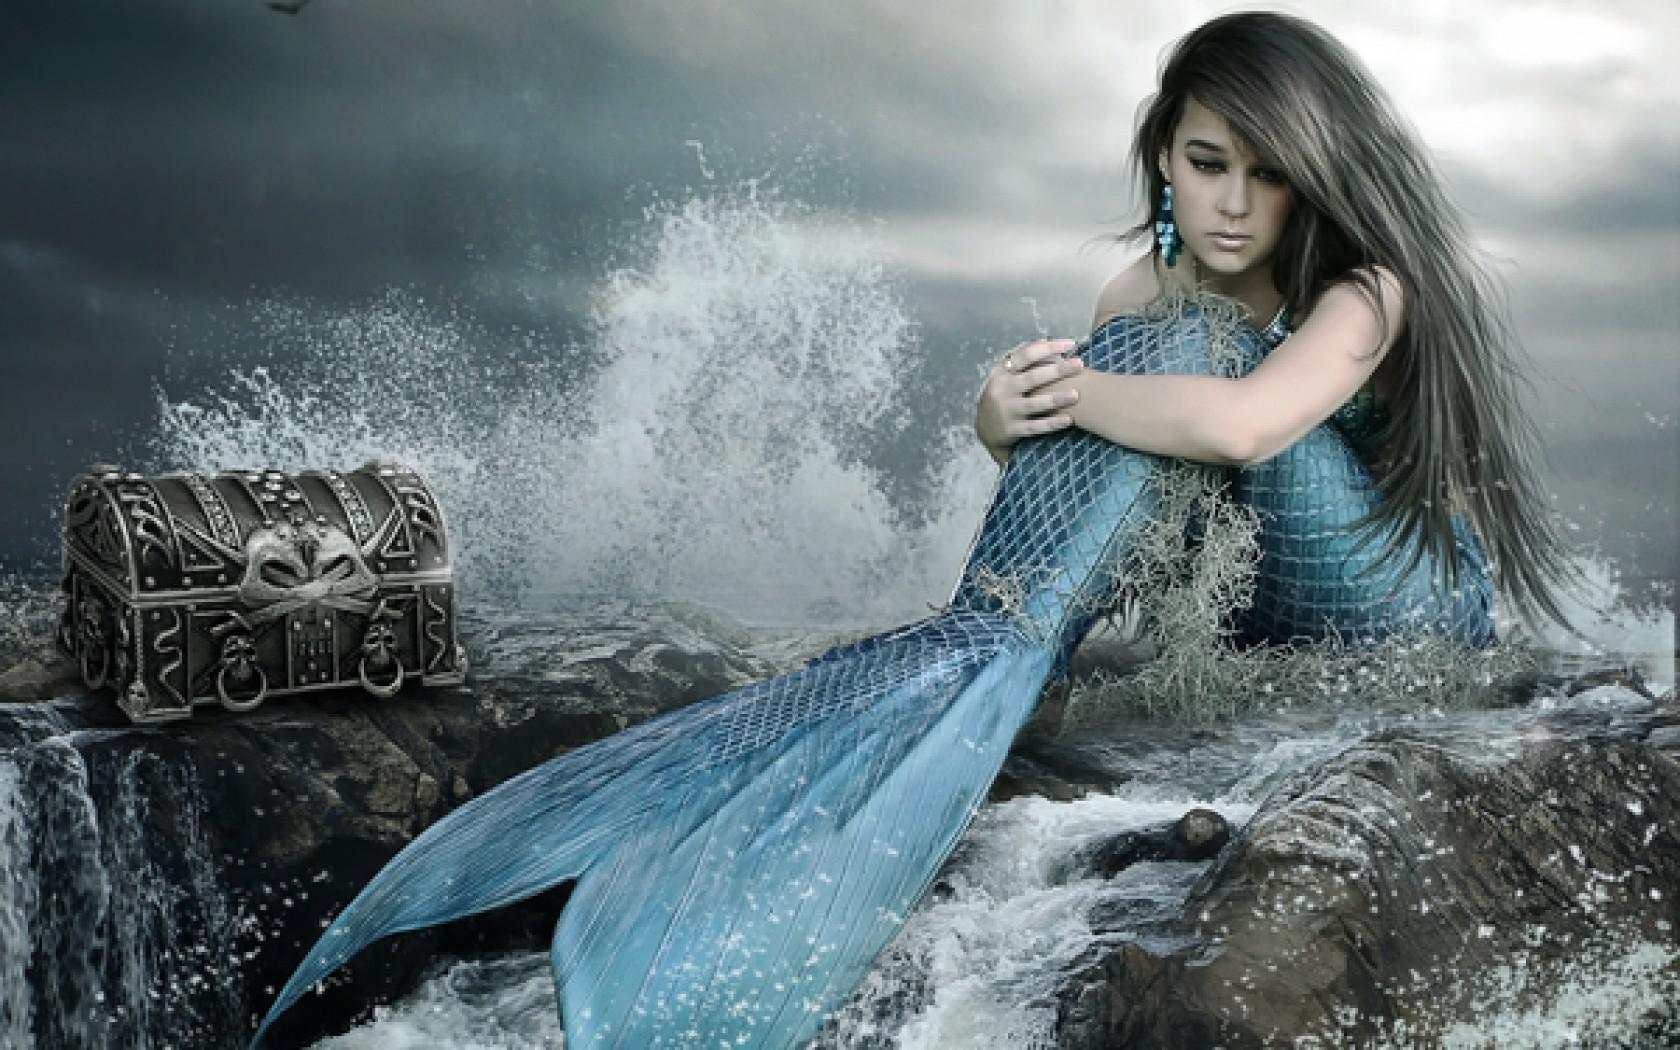 Mermaid Backgrounds, Compatible - PC, Mobile, Gadgets  1680x1050 px